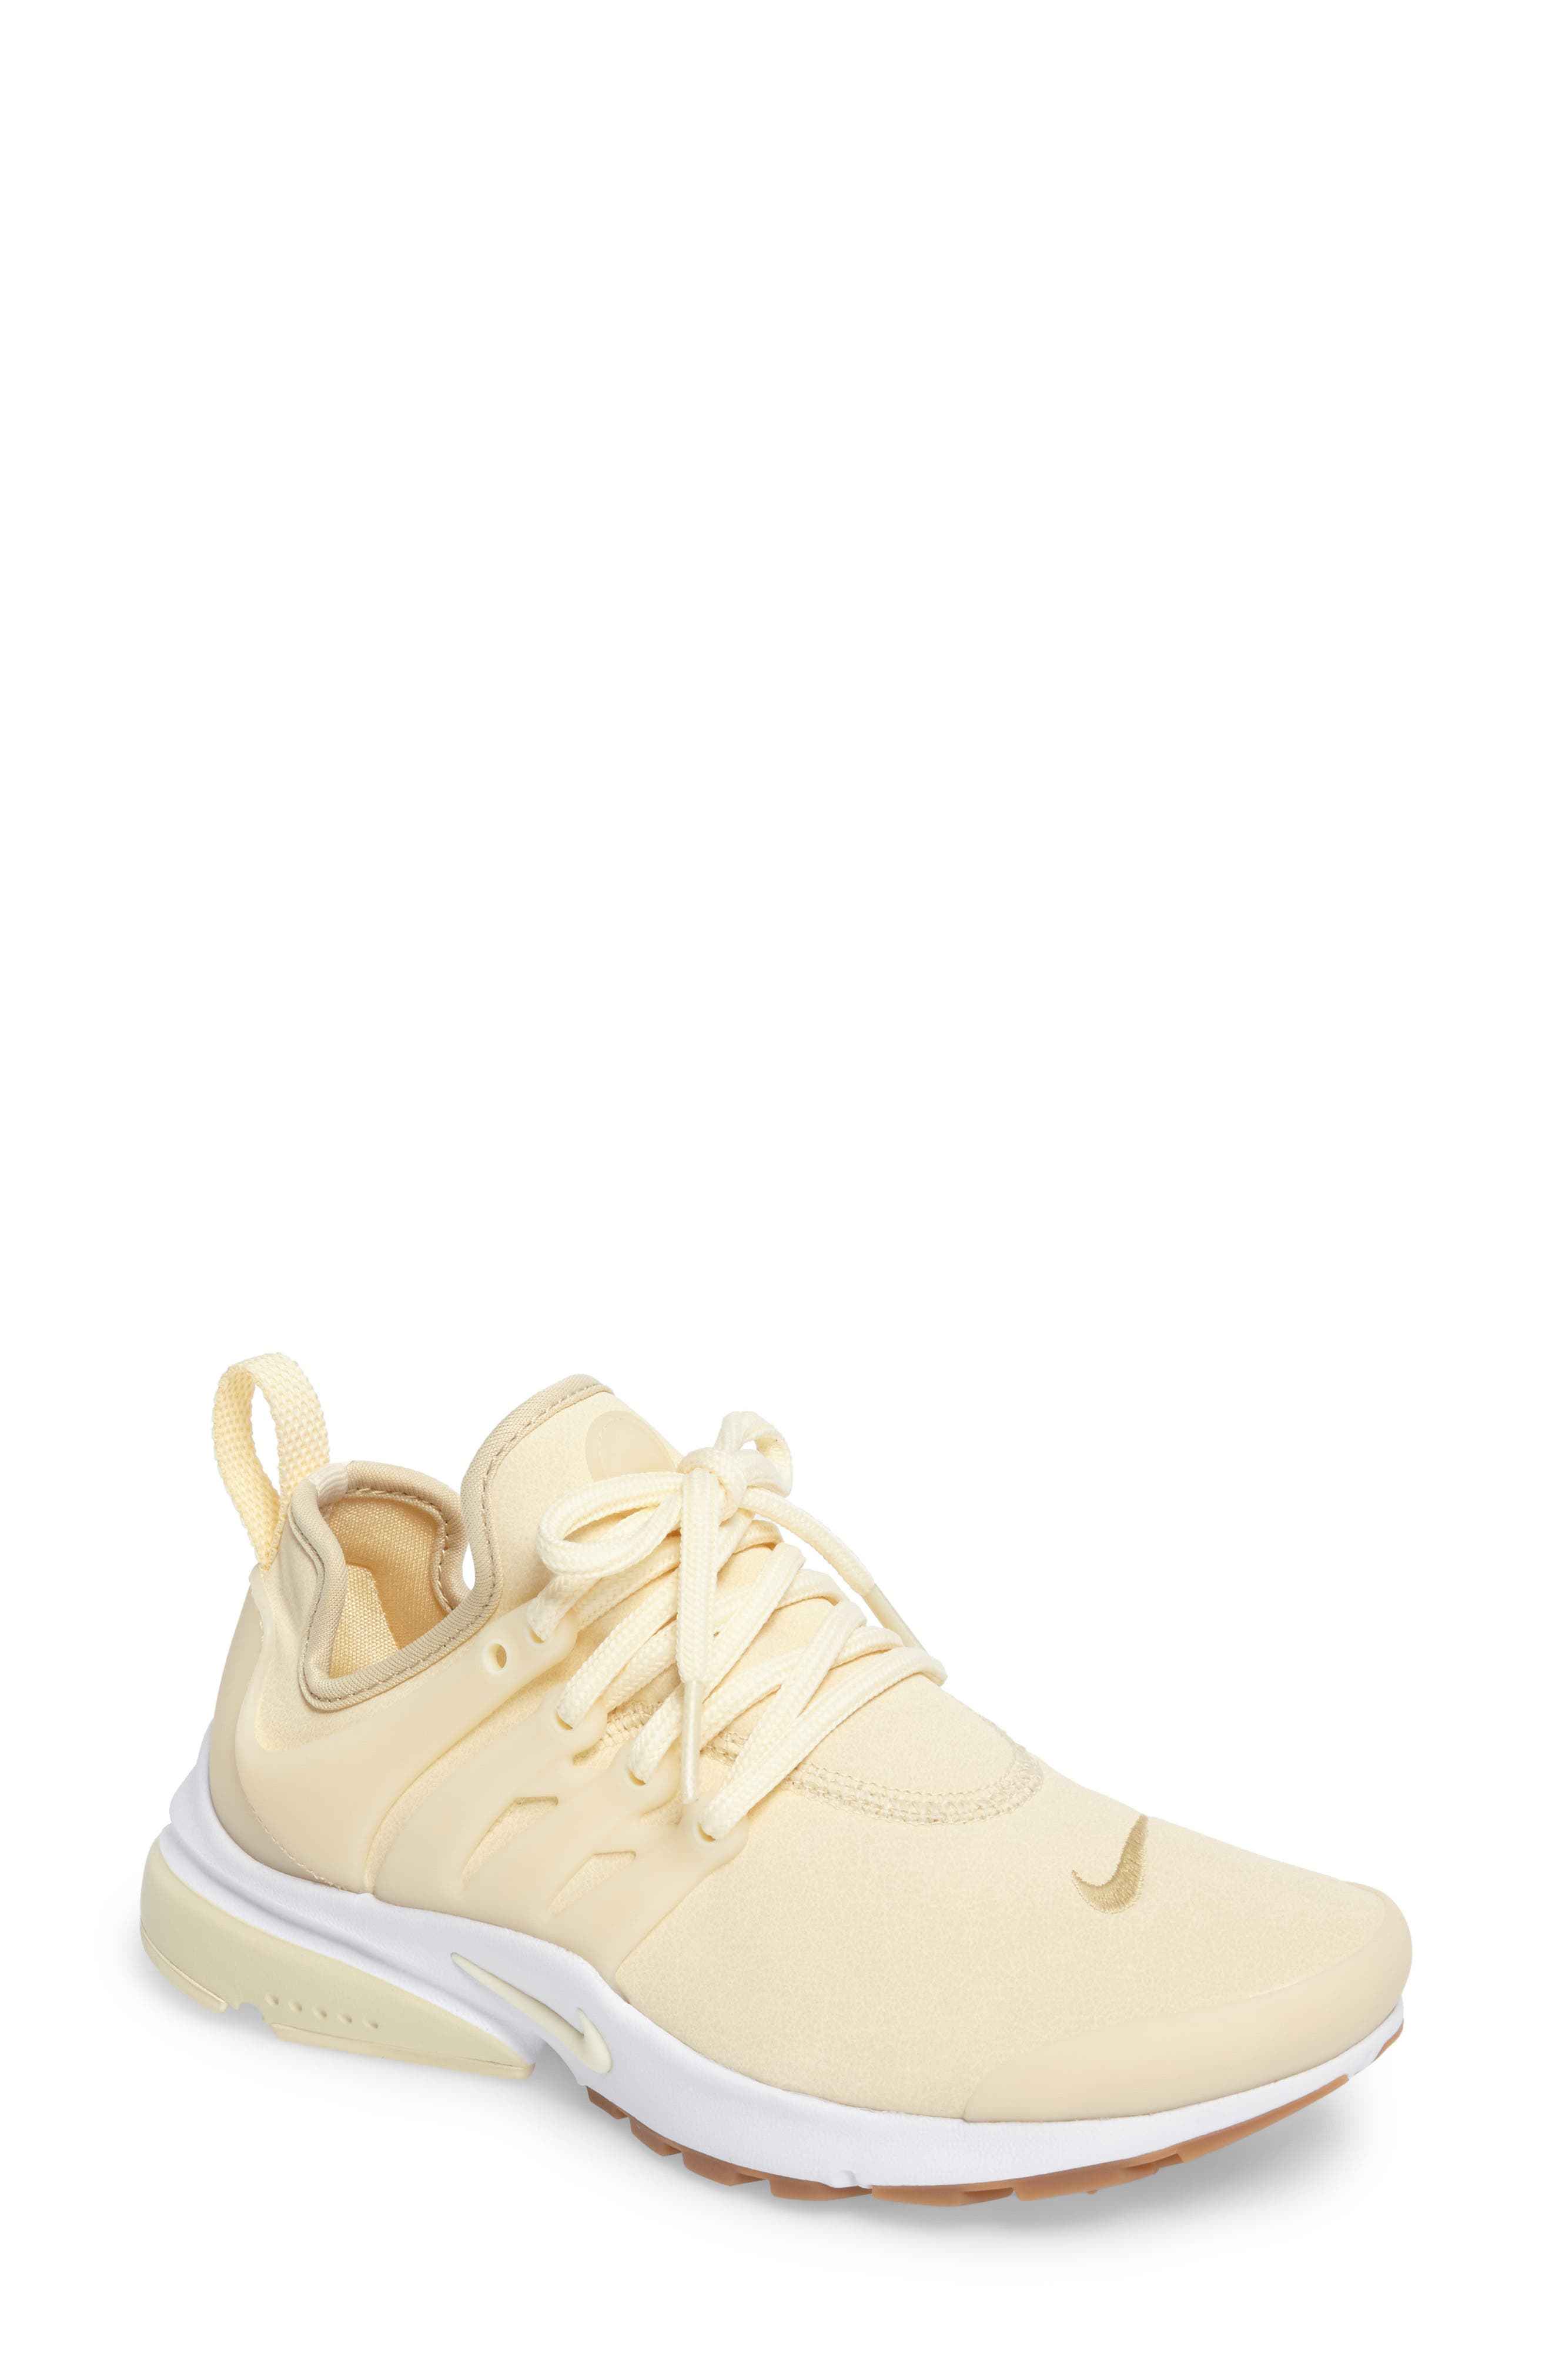 Nike Air Presto Premium Sneaker (Women)